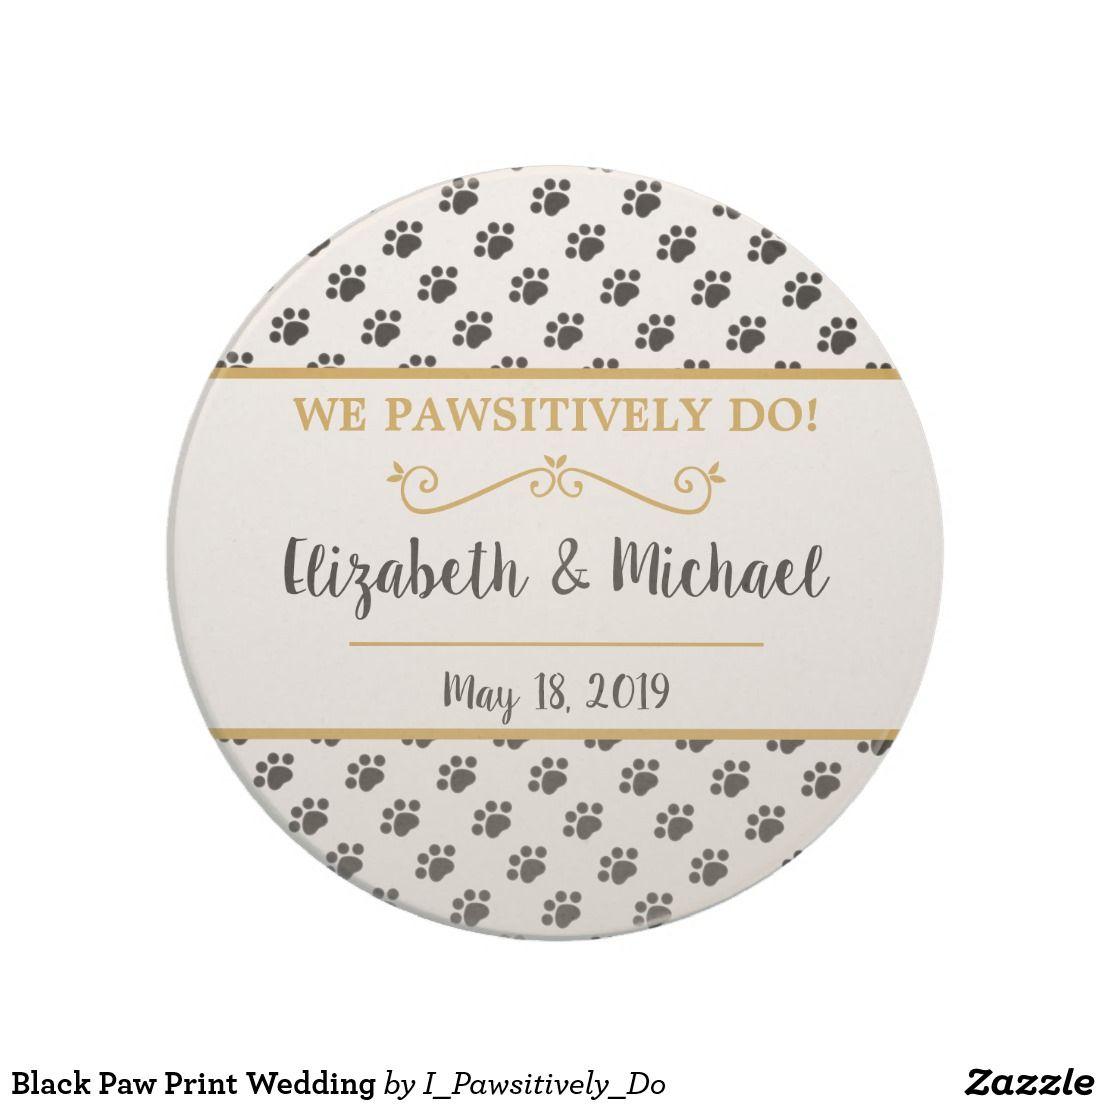 Black Paw Print Wedding Coaster